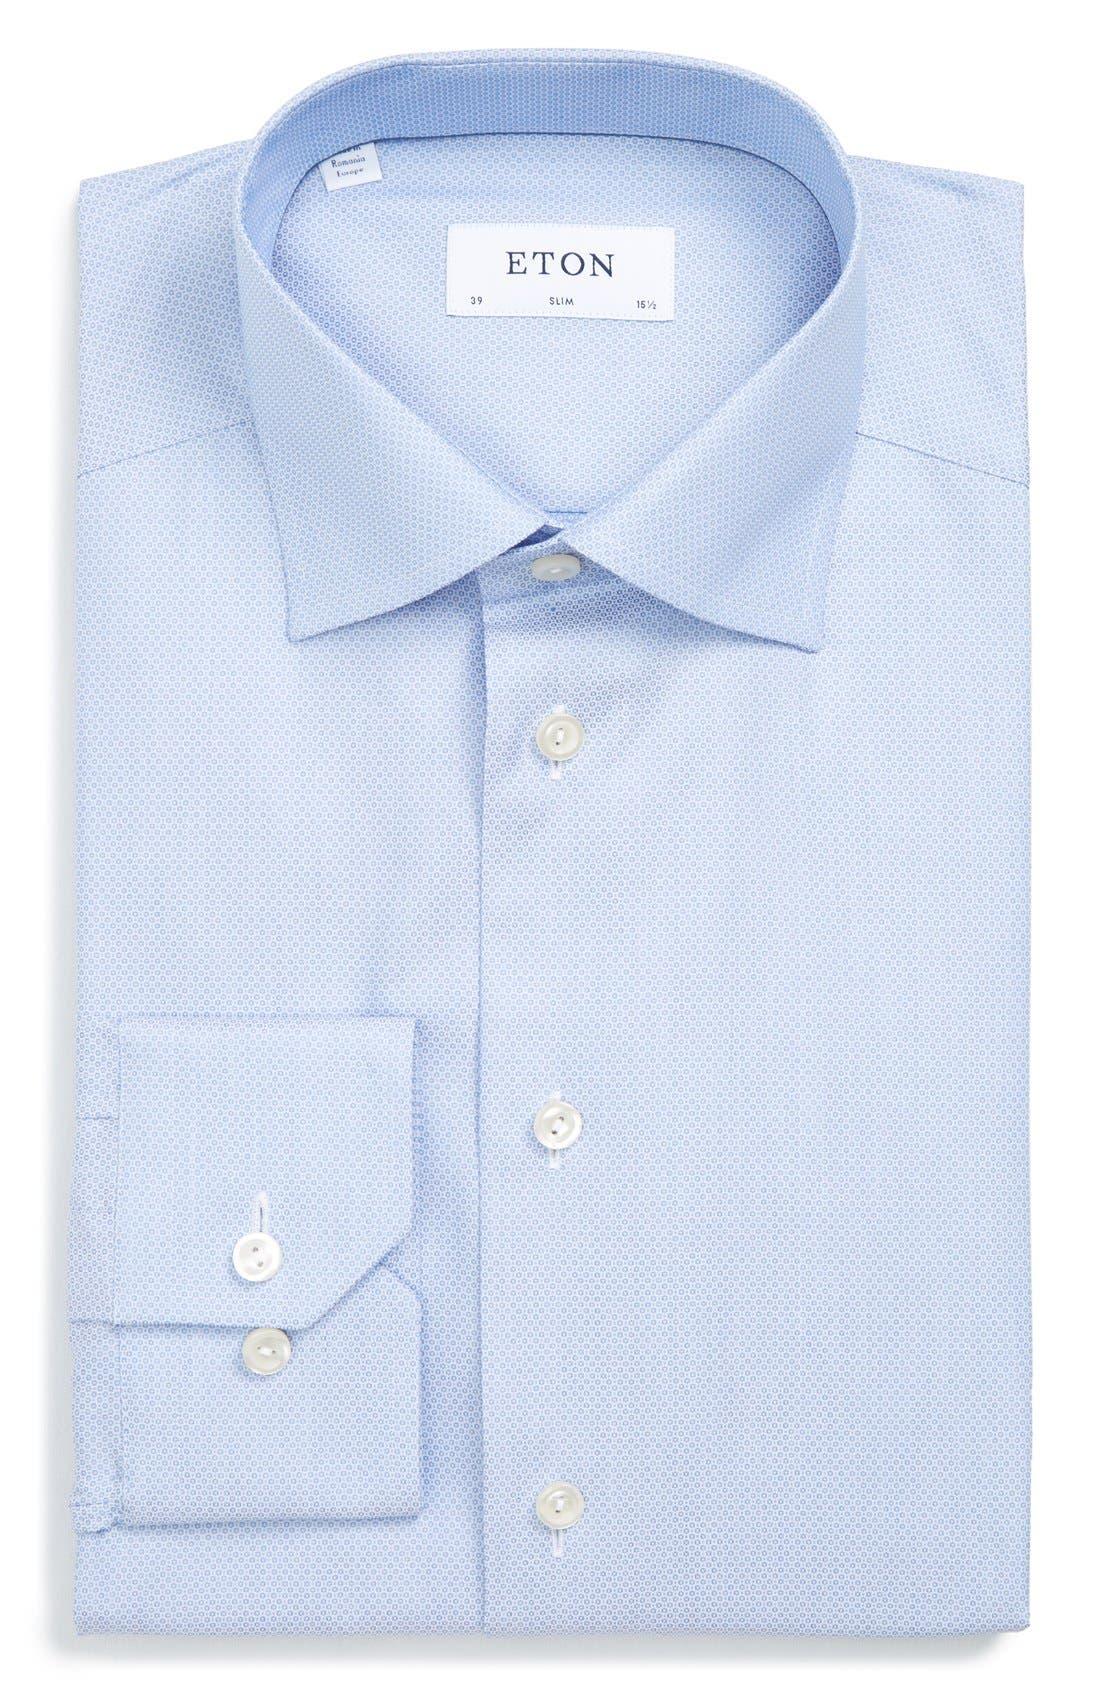 Alternate Image 1 Selected - Eton Slim Fit Dot Dress Shirt